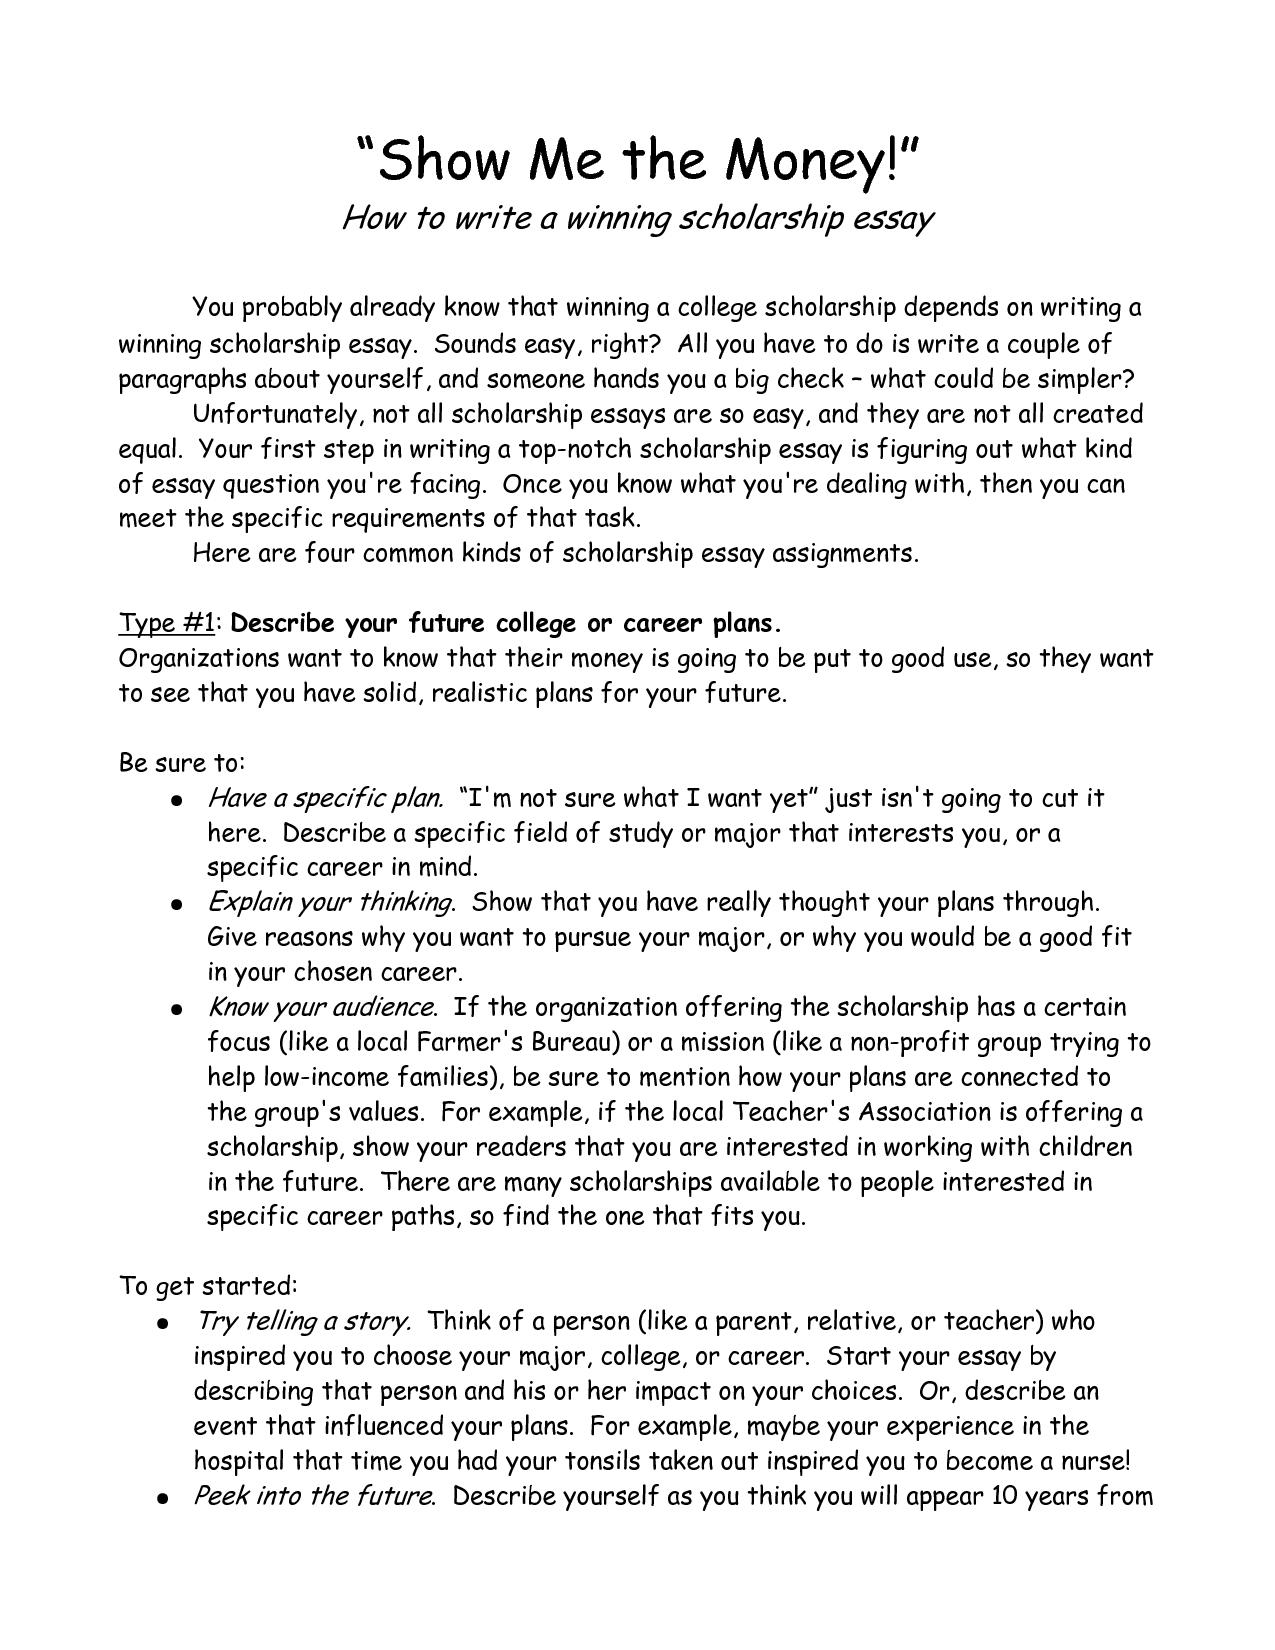 003 Scholarship Essay Tips Example Singular Gilman Psc Goldwater Full